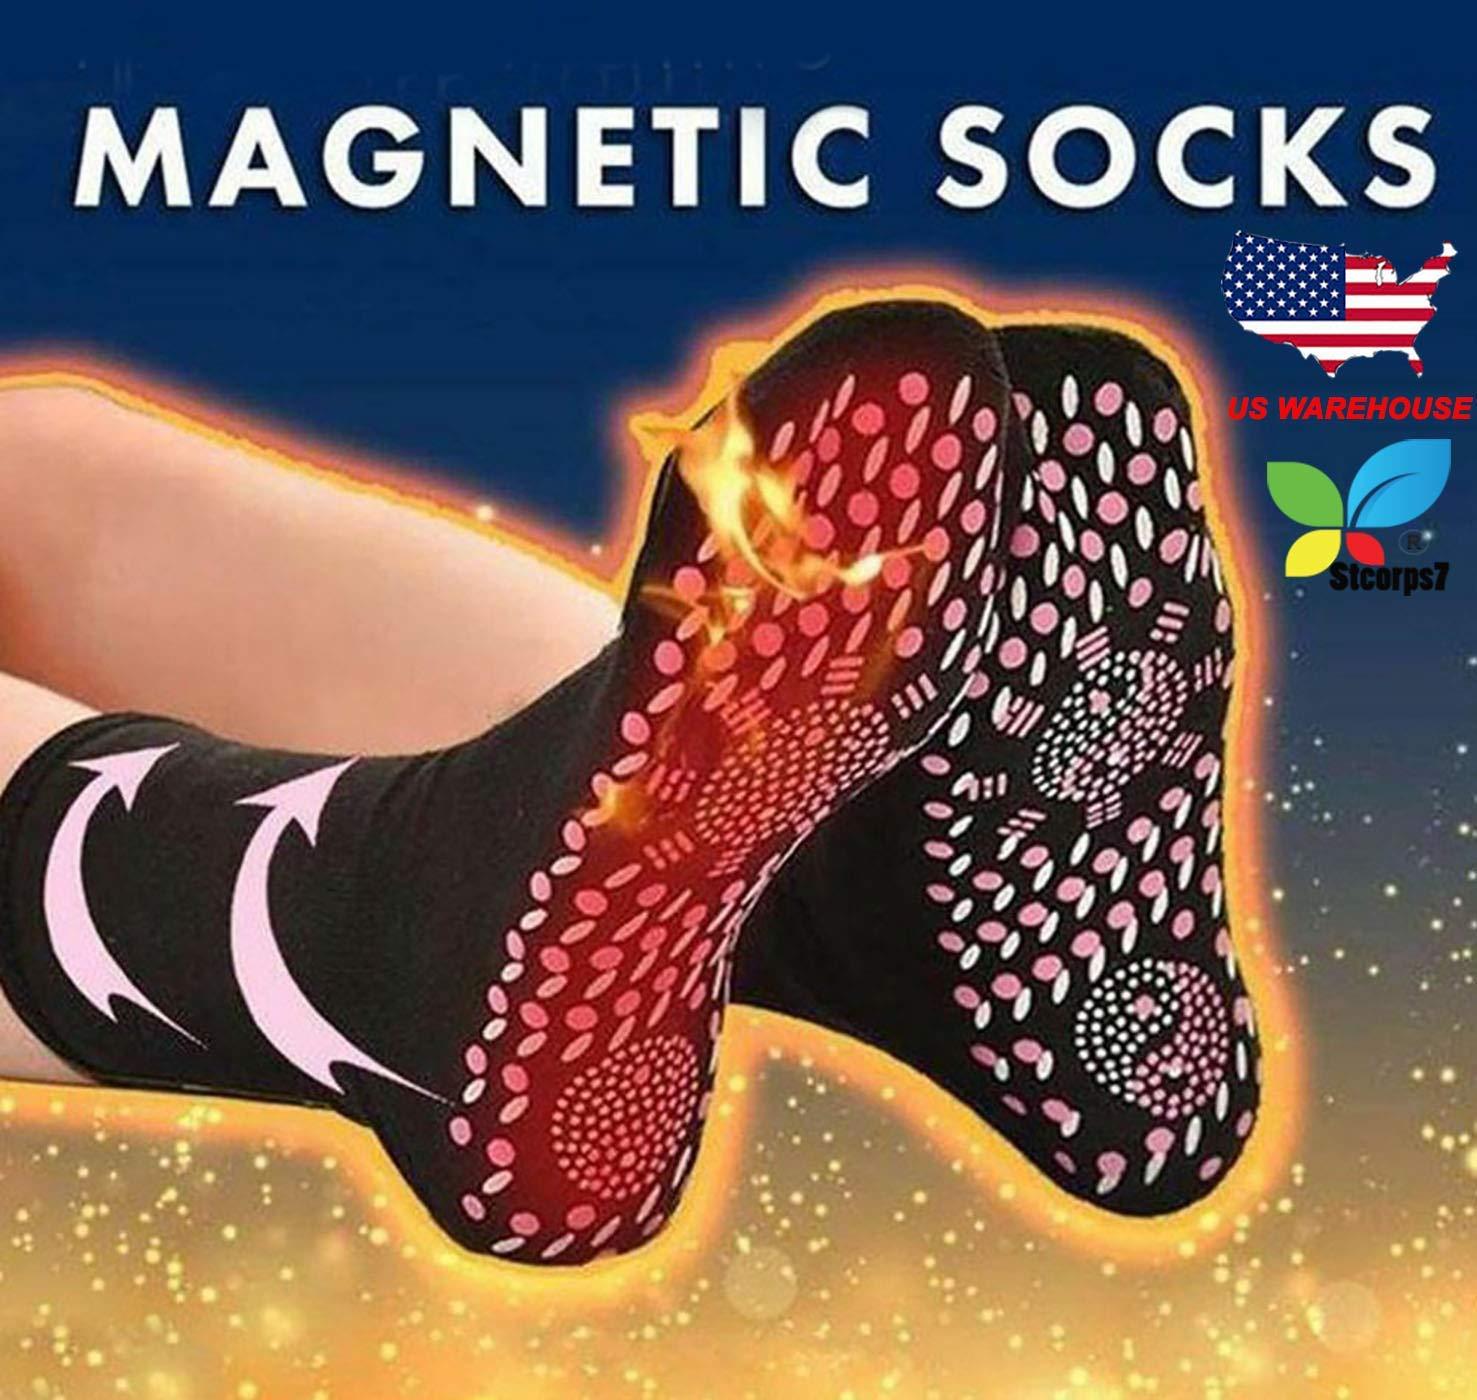 Self Heating Socks, Stcorps7 Tourmaline Self-Heating Therapy Magnetic Socks Comfortable Breathable Massage Anti-Freezing Warm Foot Socks Outdoor Skiing (Black)